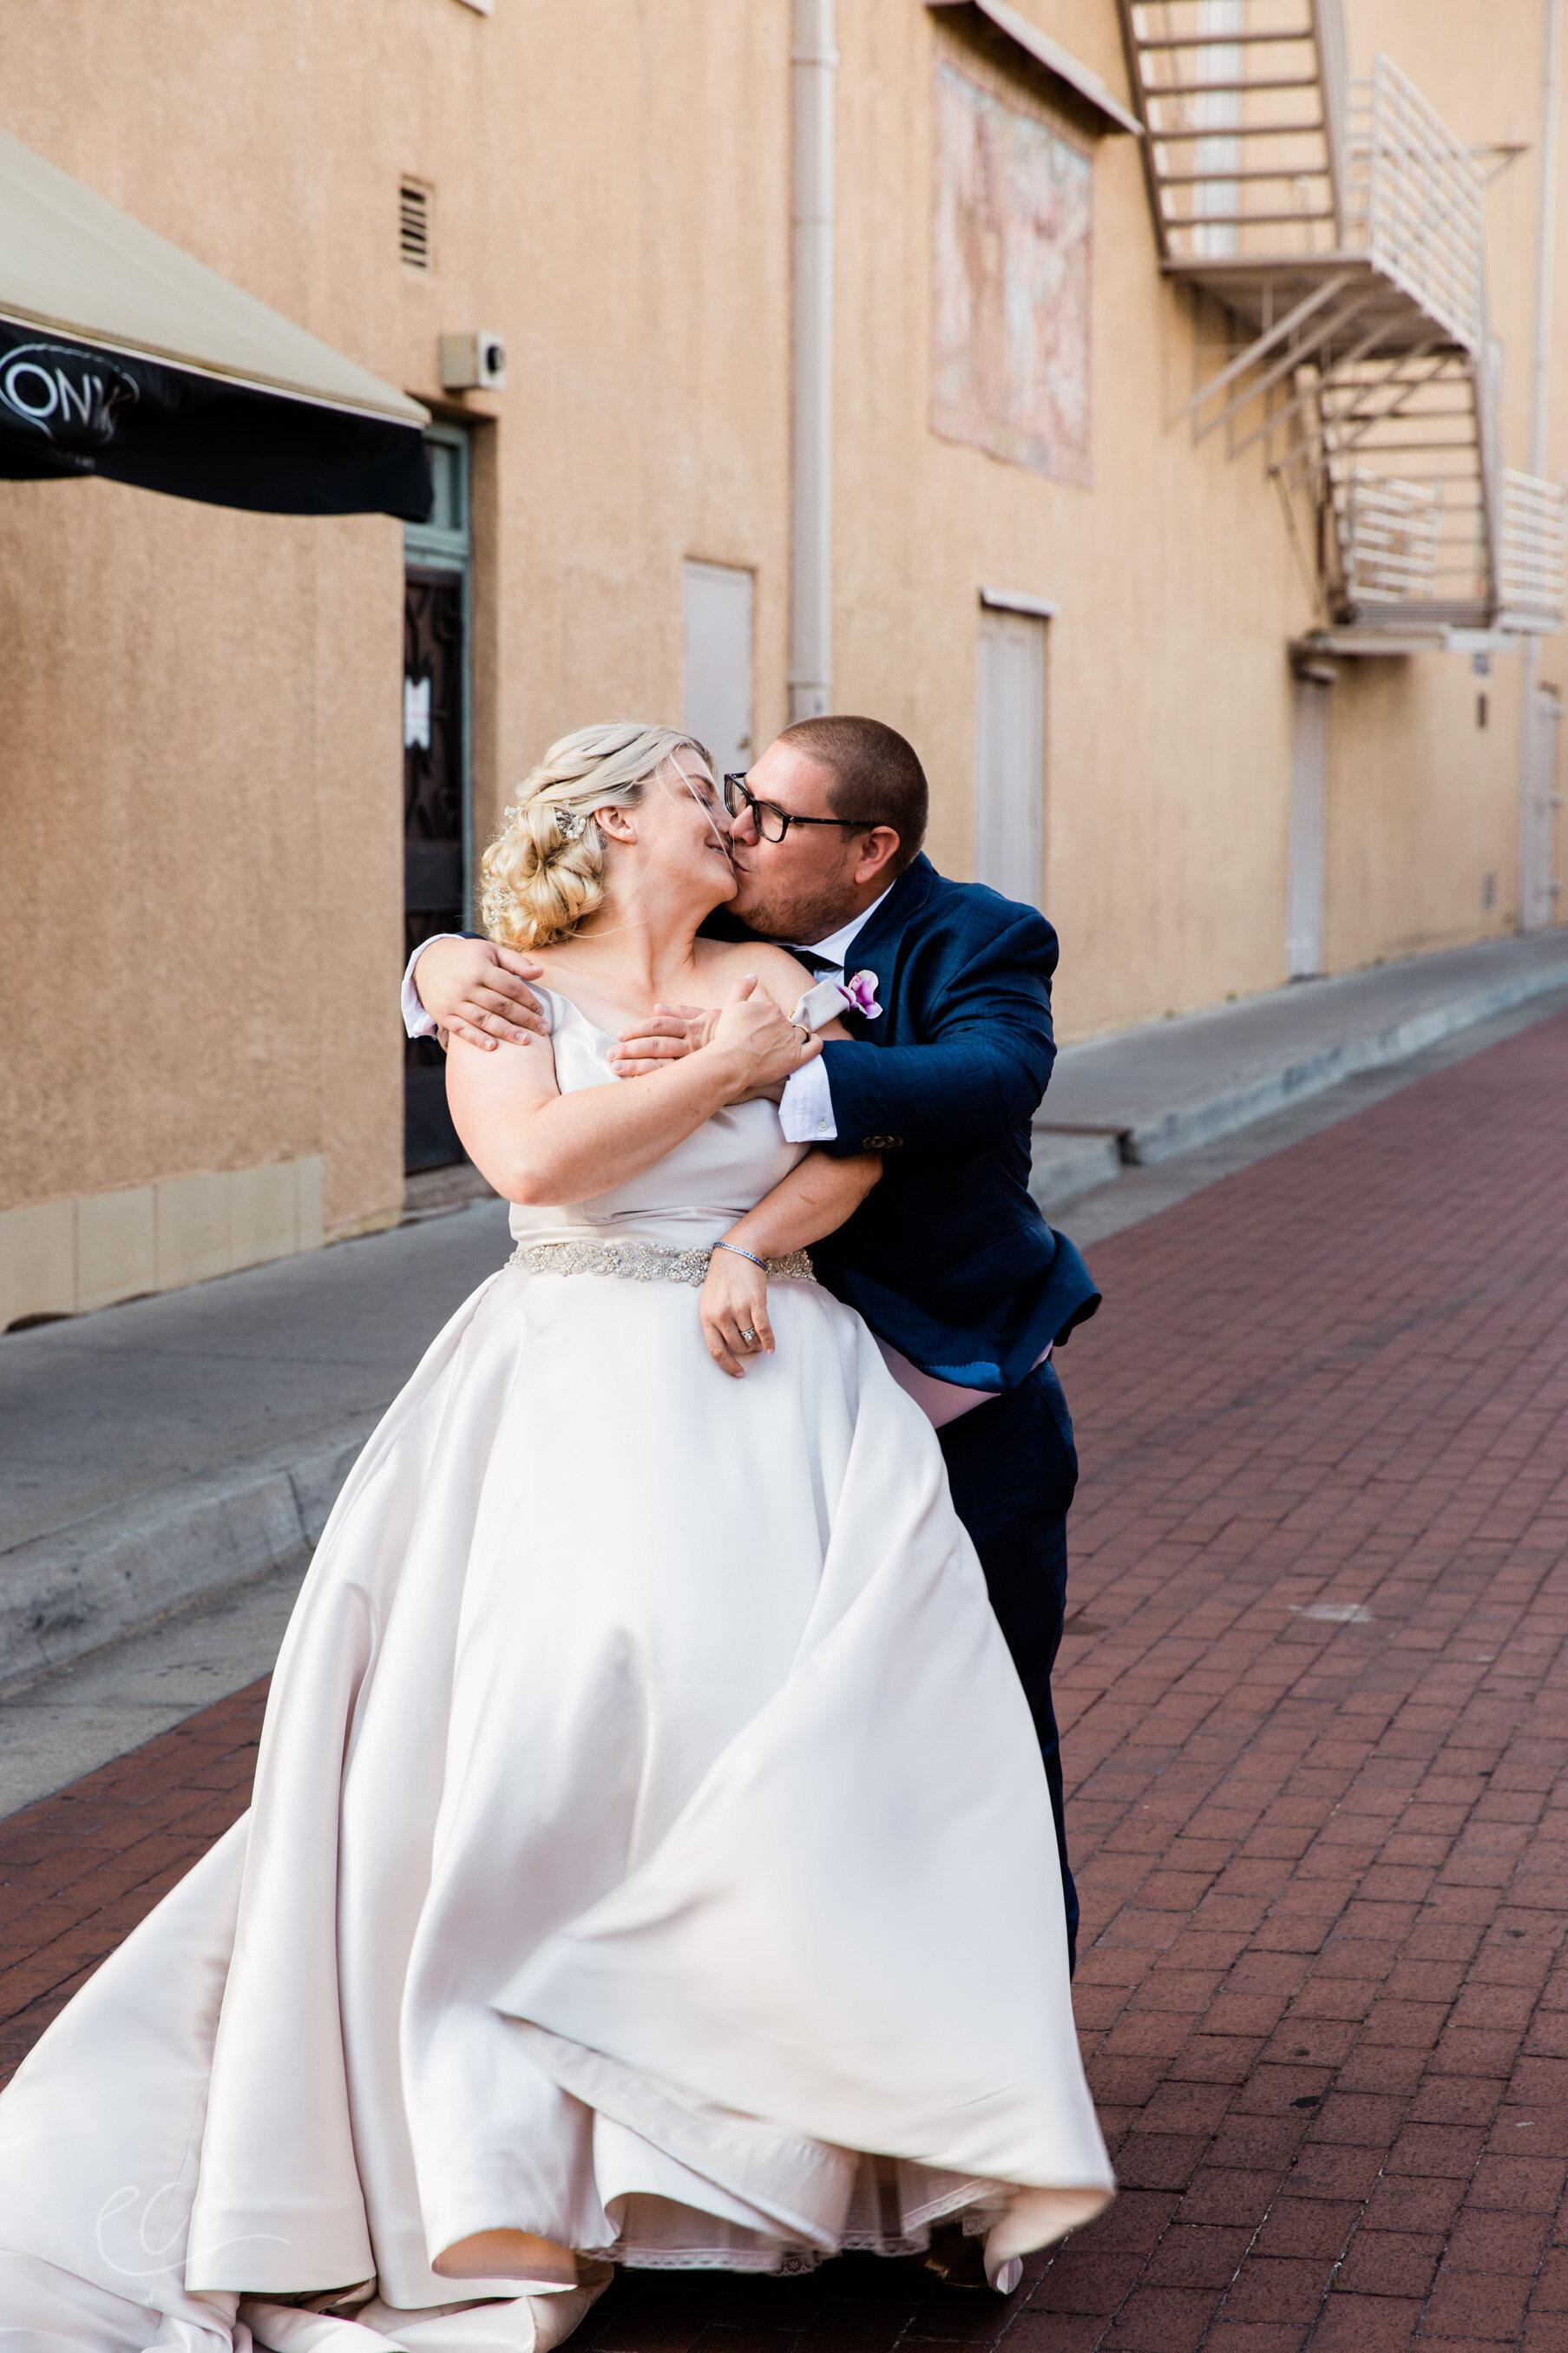 Santafe_wedding_photography_kellyzac-60.jpg